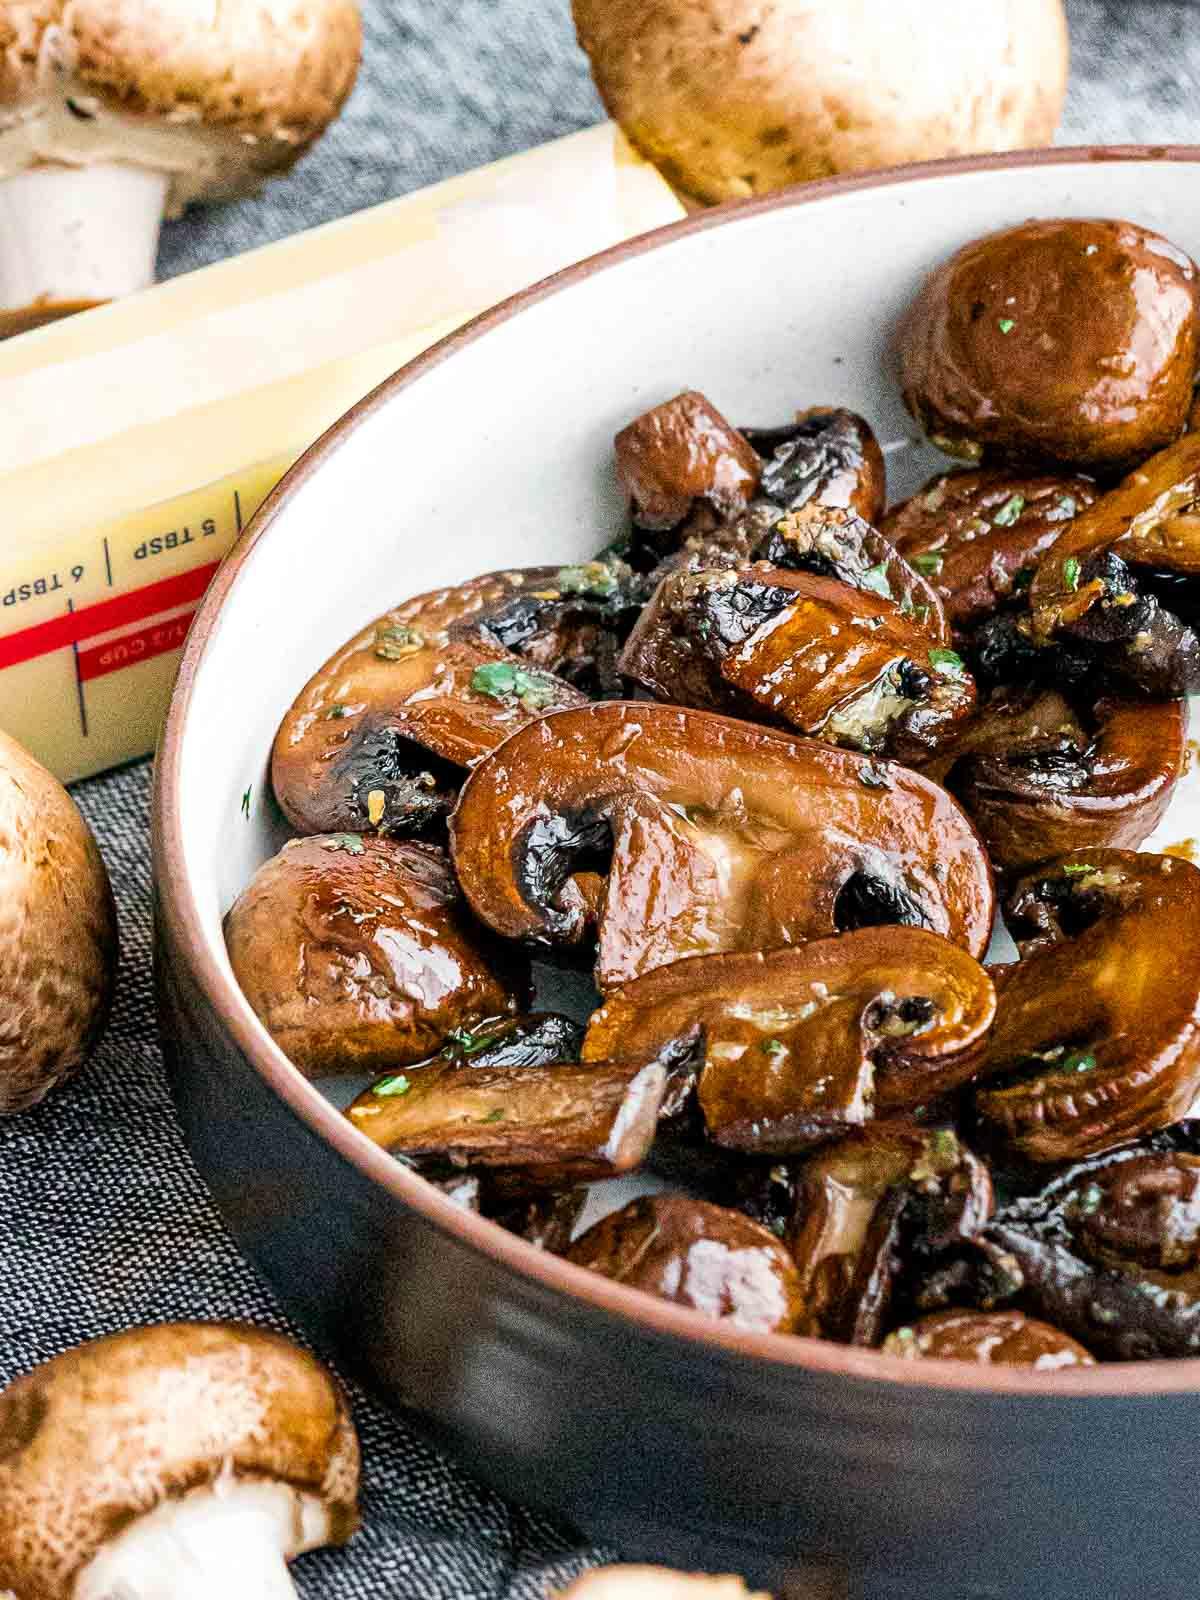 golden brown garlic butter mushrooms in a bowl next to a stick of butter